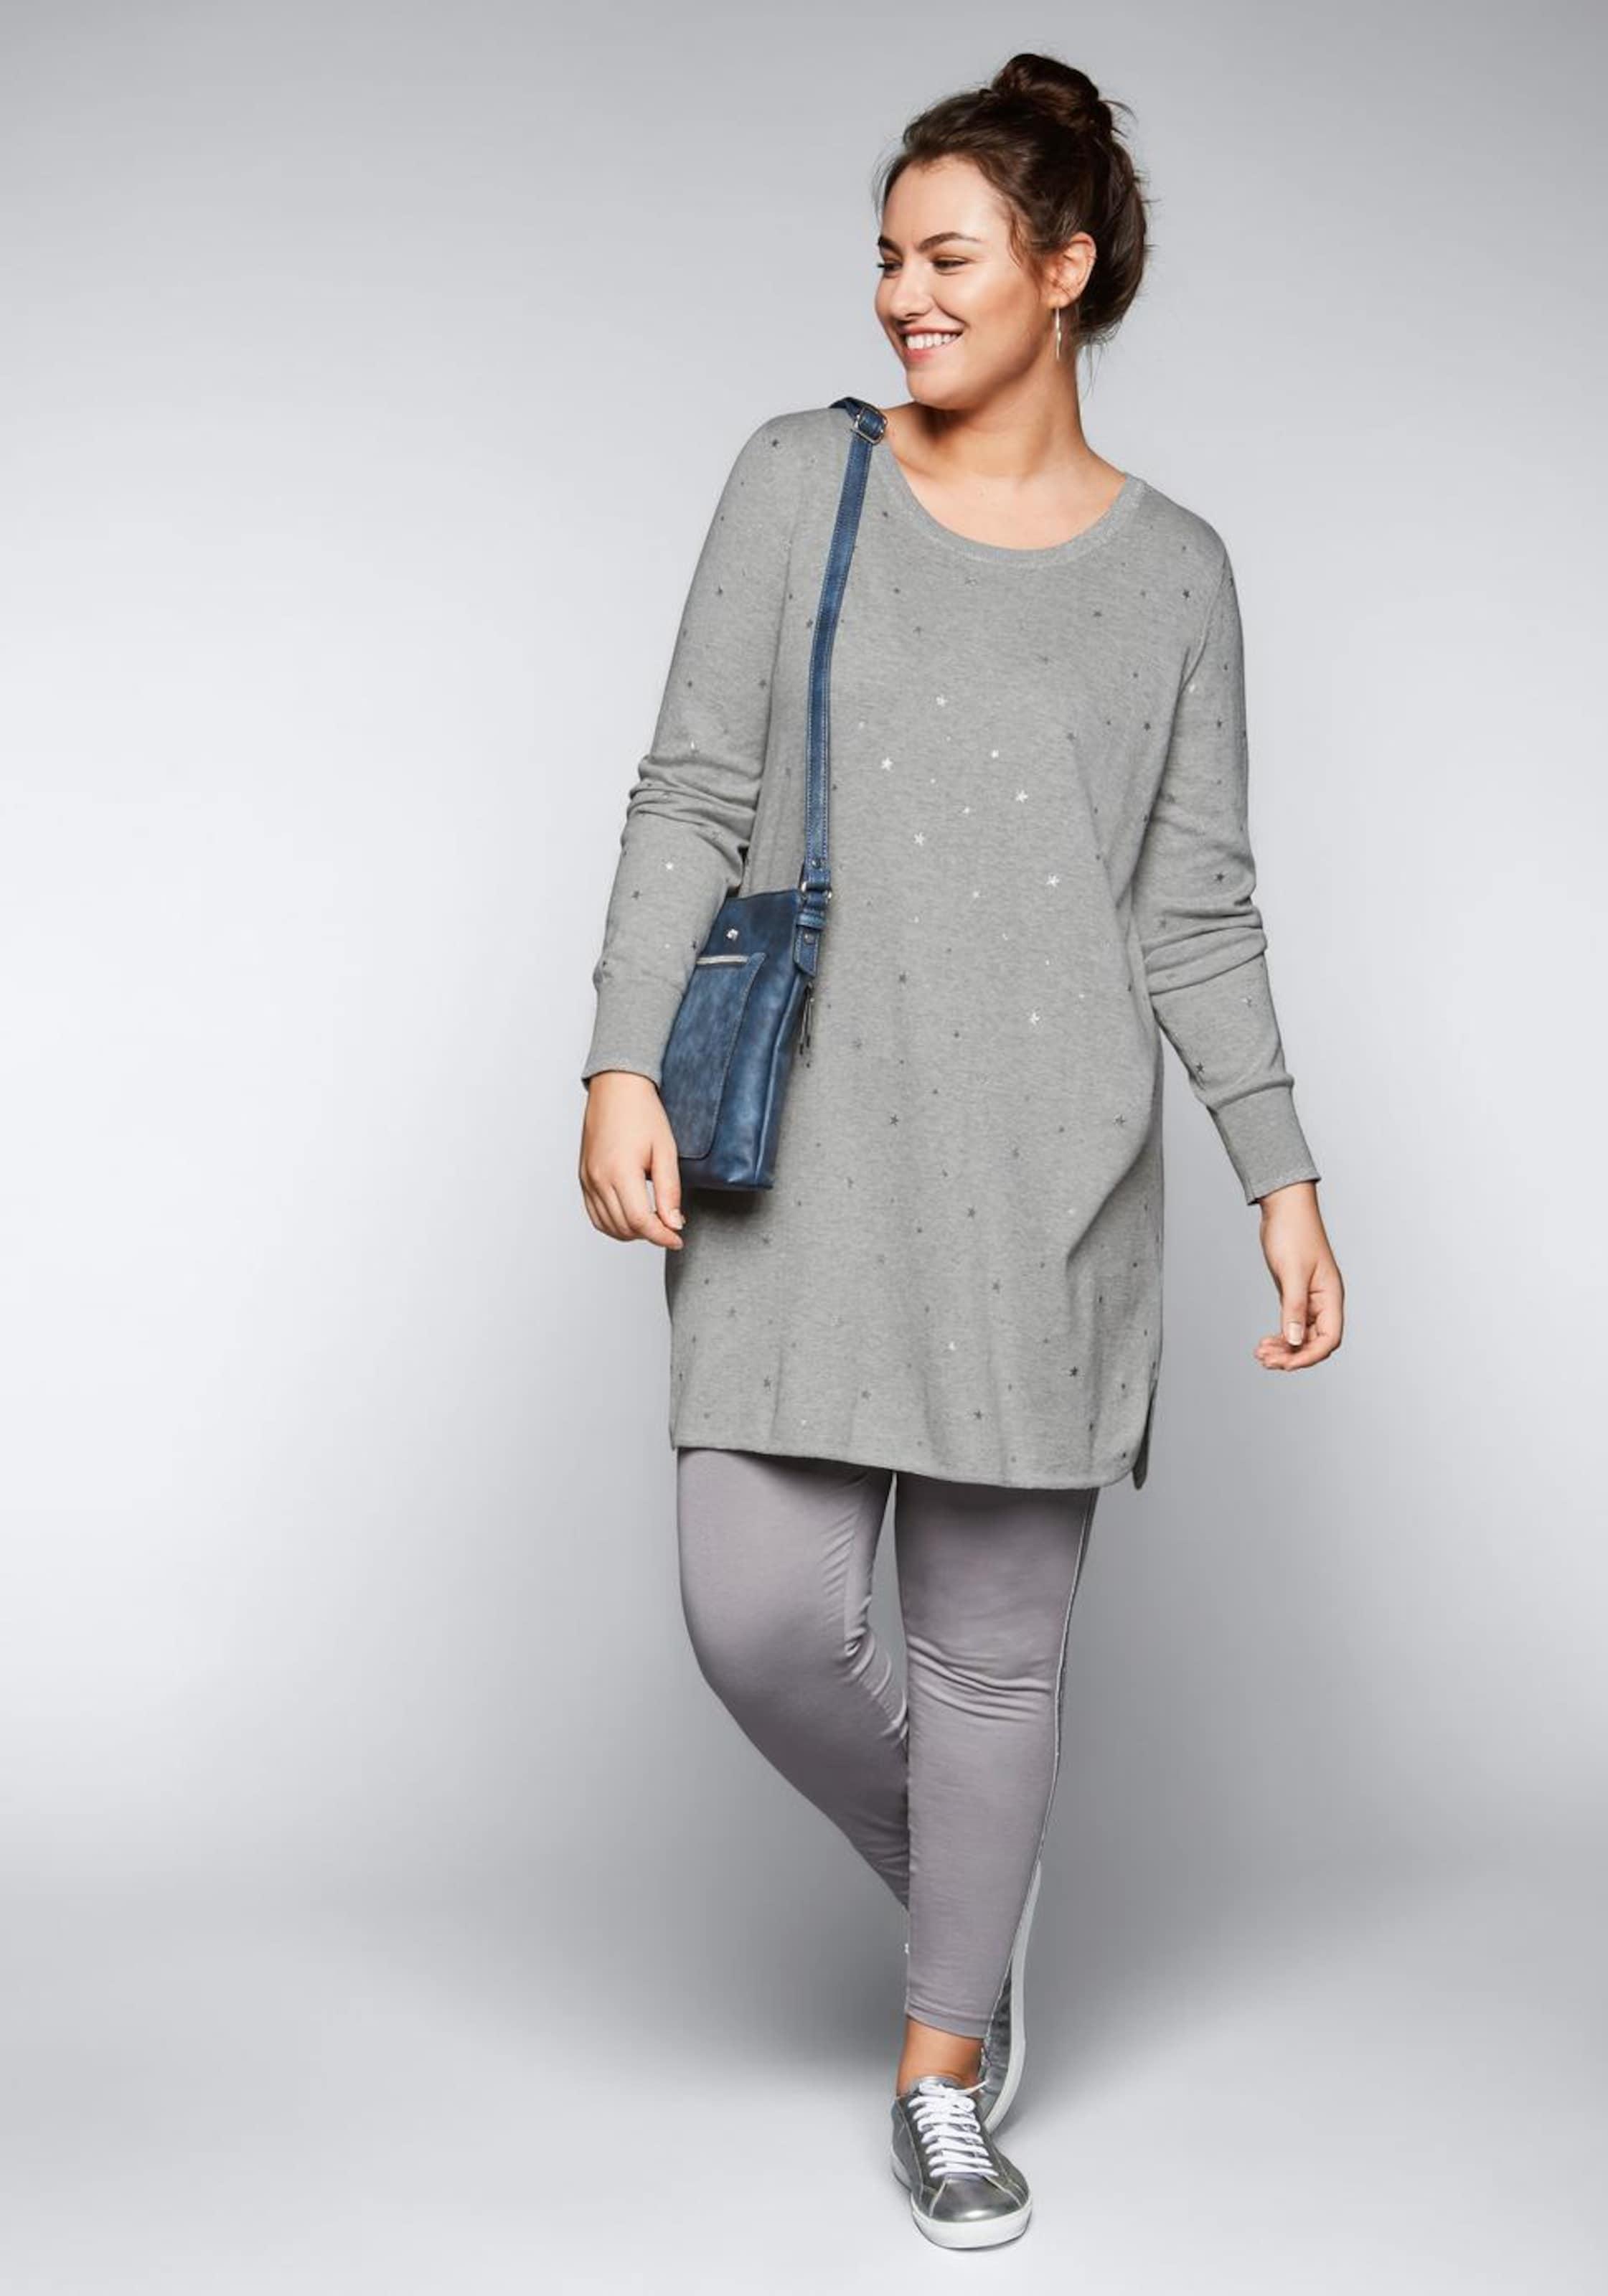 Sheego Sheego In Pullover Sheego In Pullover Pullover In Grau Grau shQdxtrCB